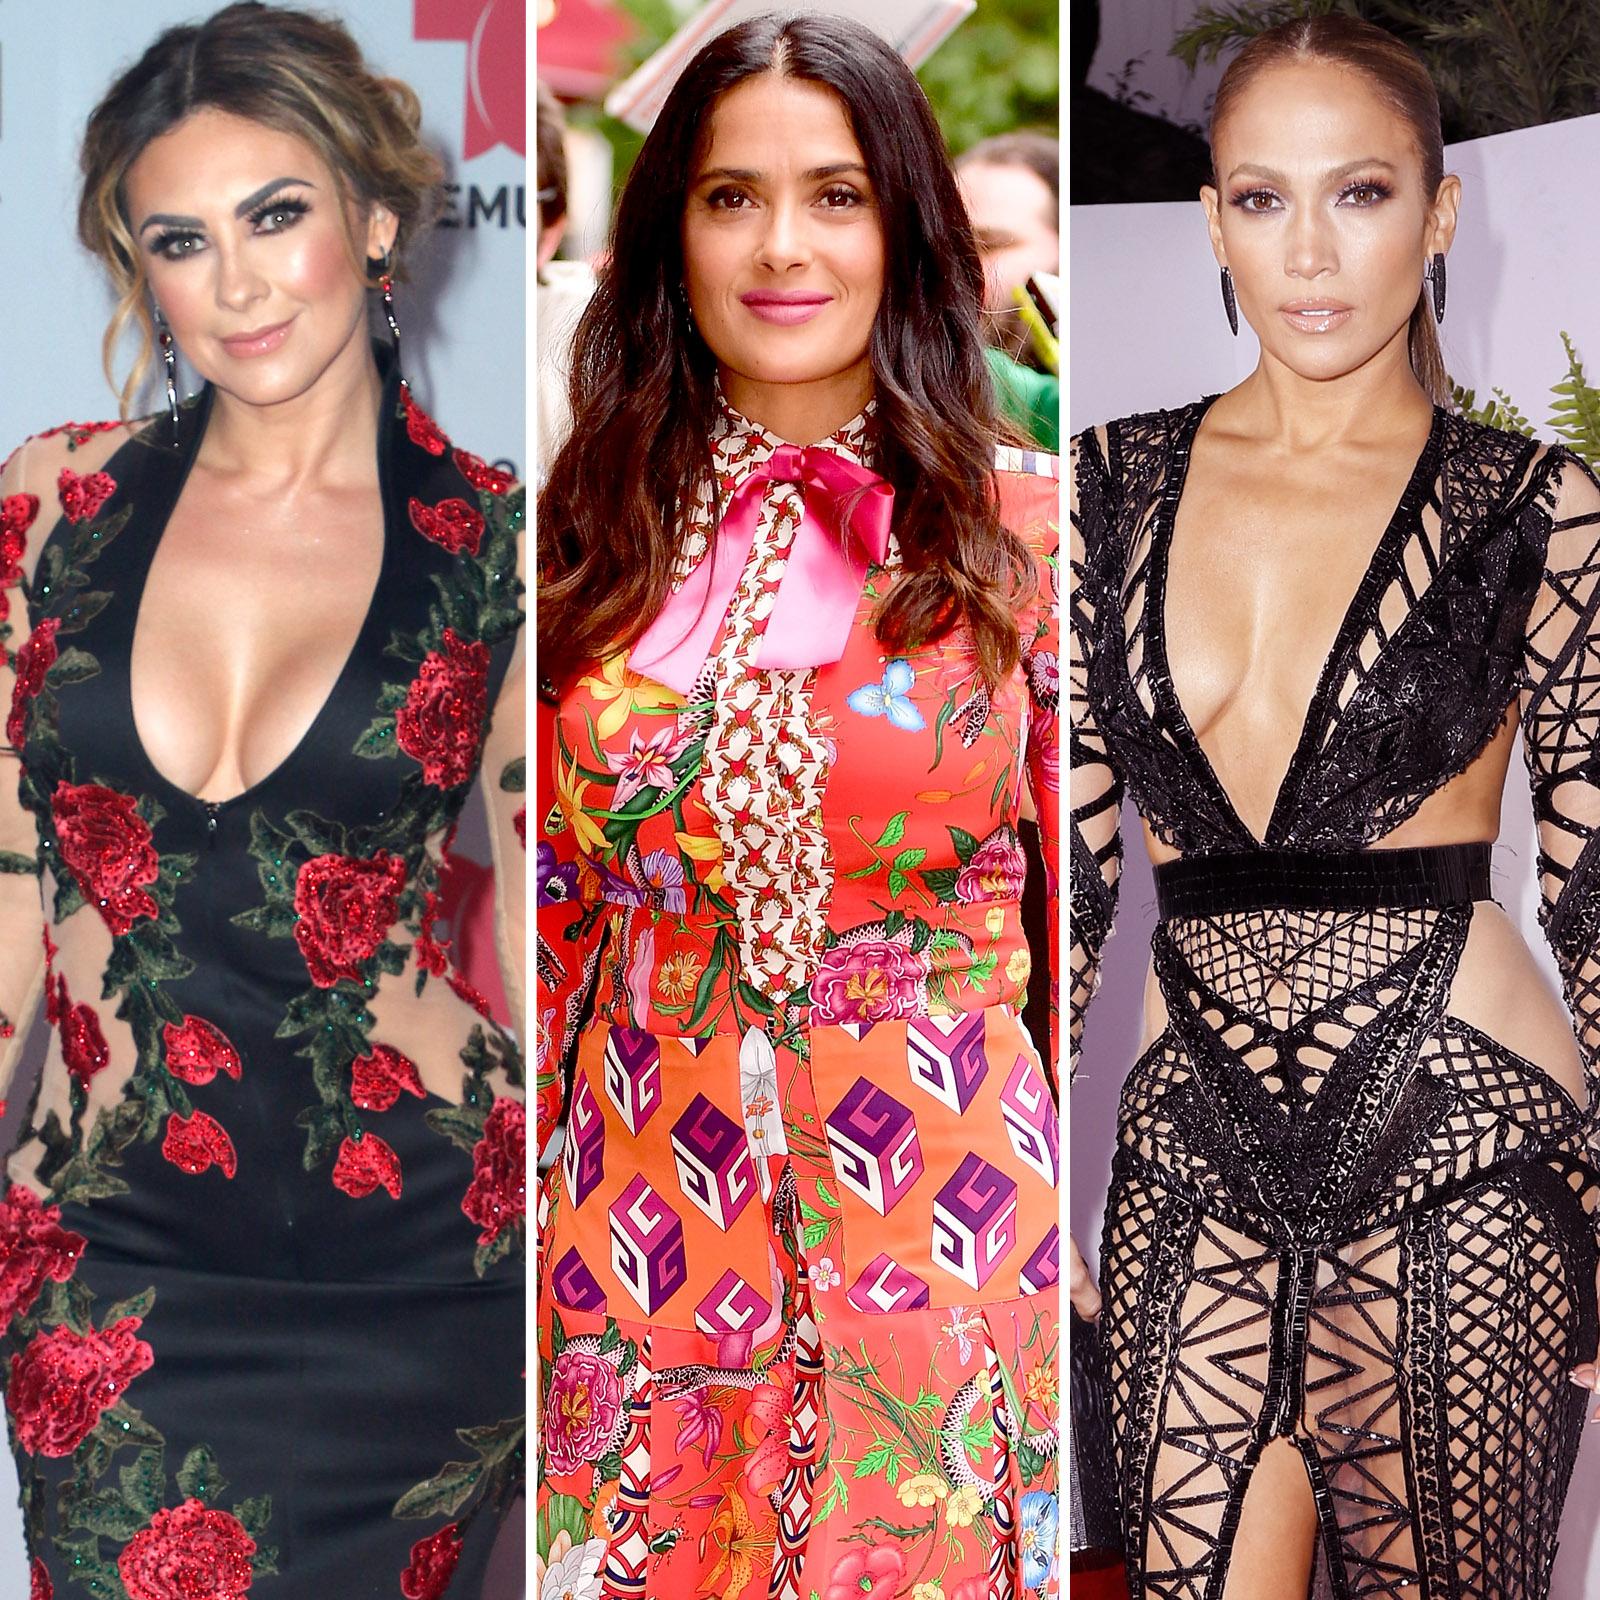 Aracely Arámbula, Salma Hayek y Jennifer Lopez